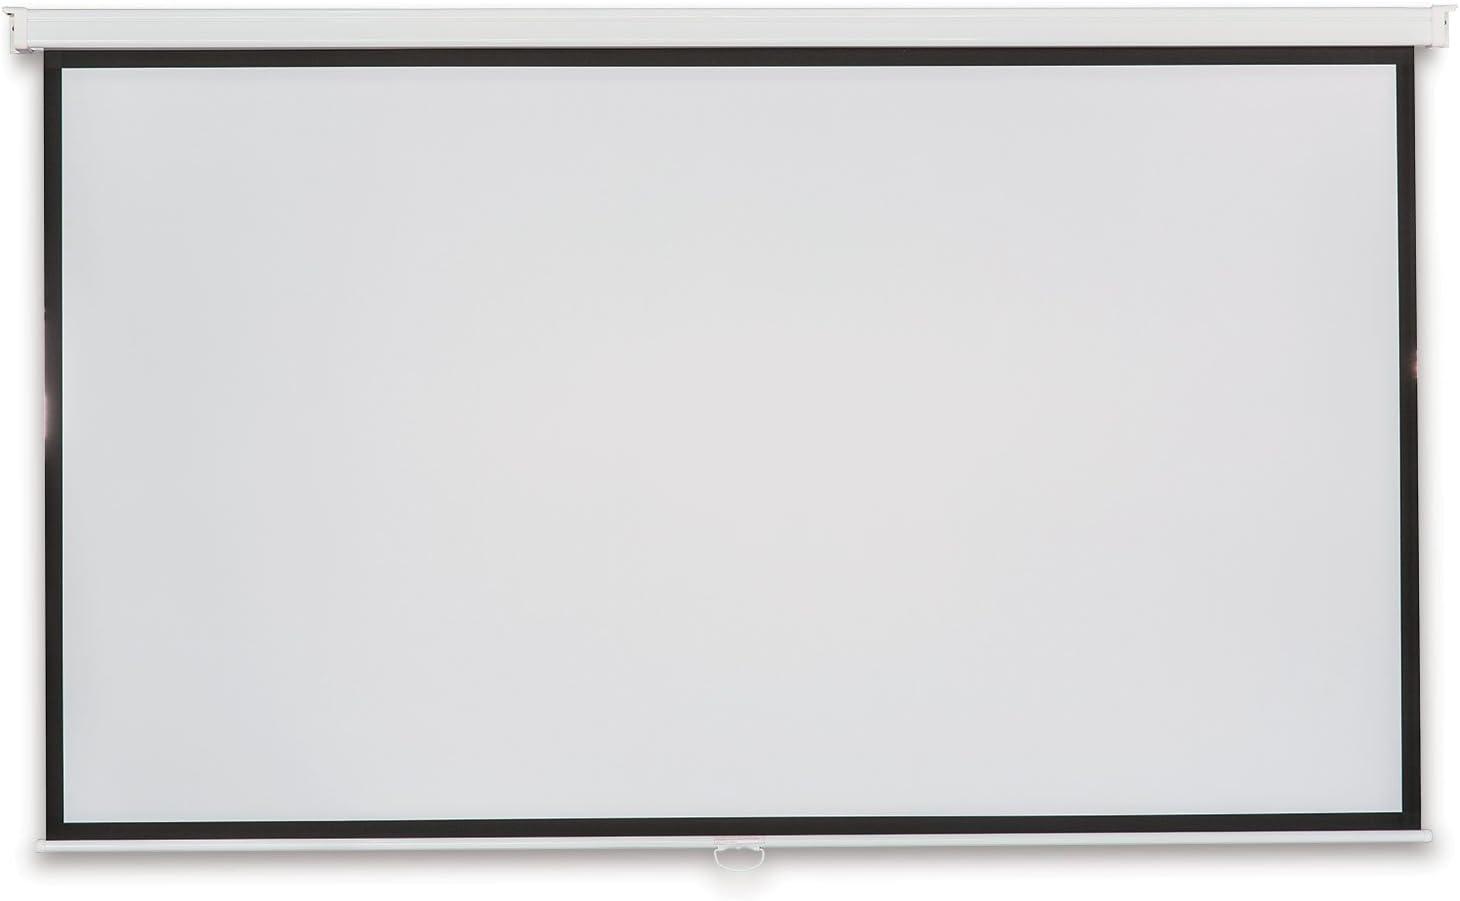 ViewSonic PJ-SCW-1001W Matt White 100 Inch 16:9 Projection Screen